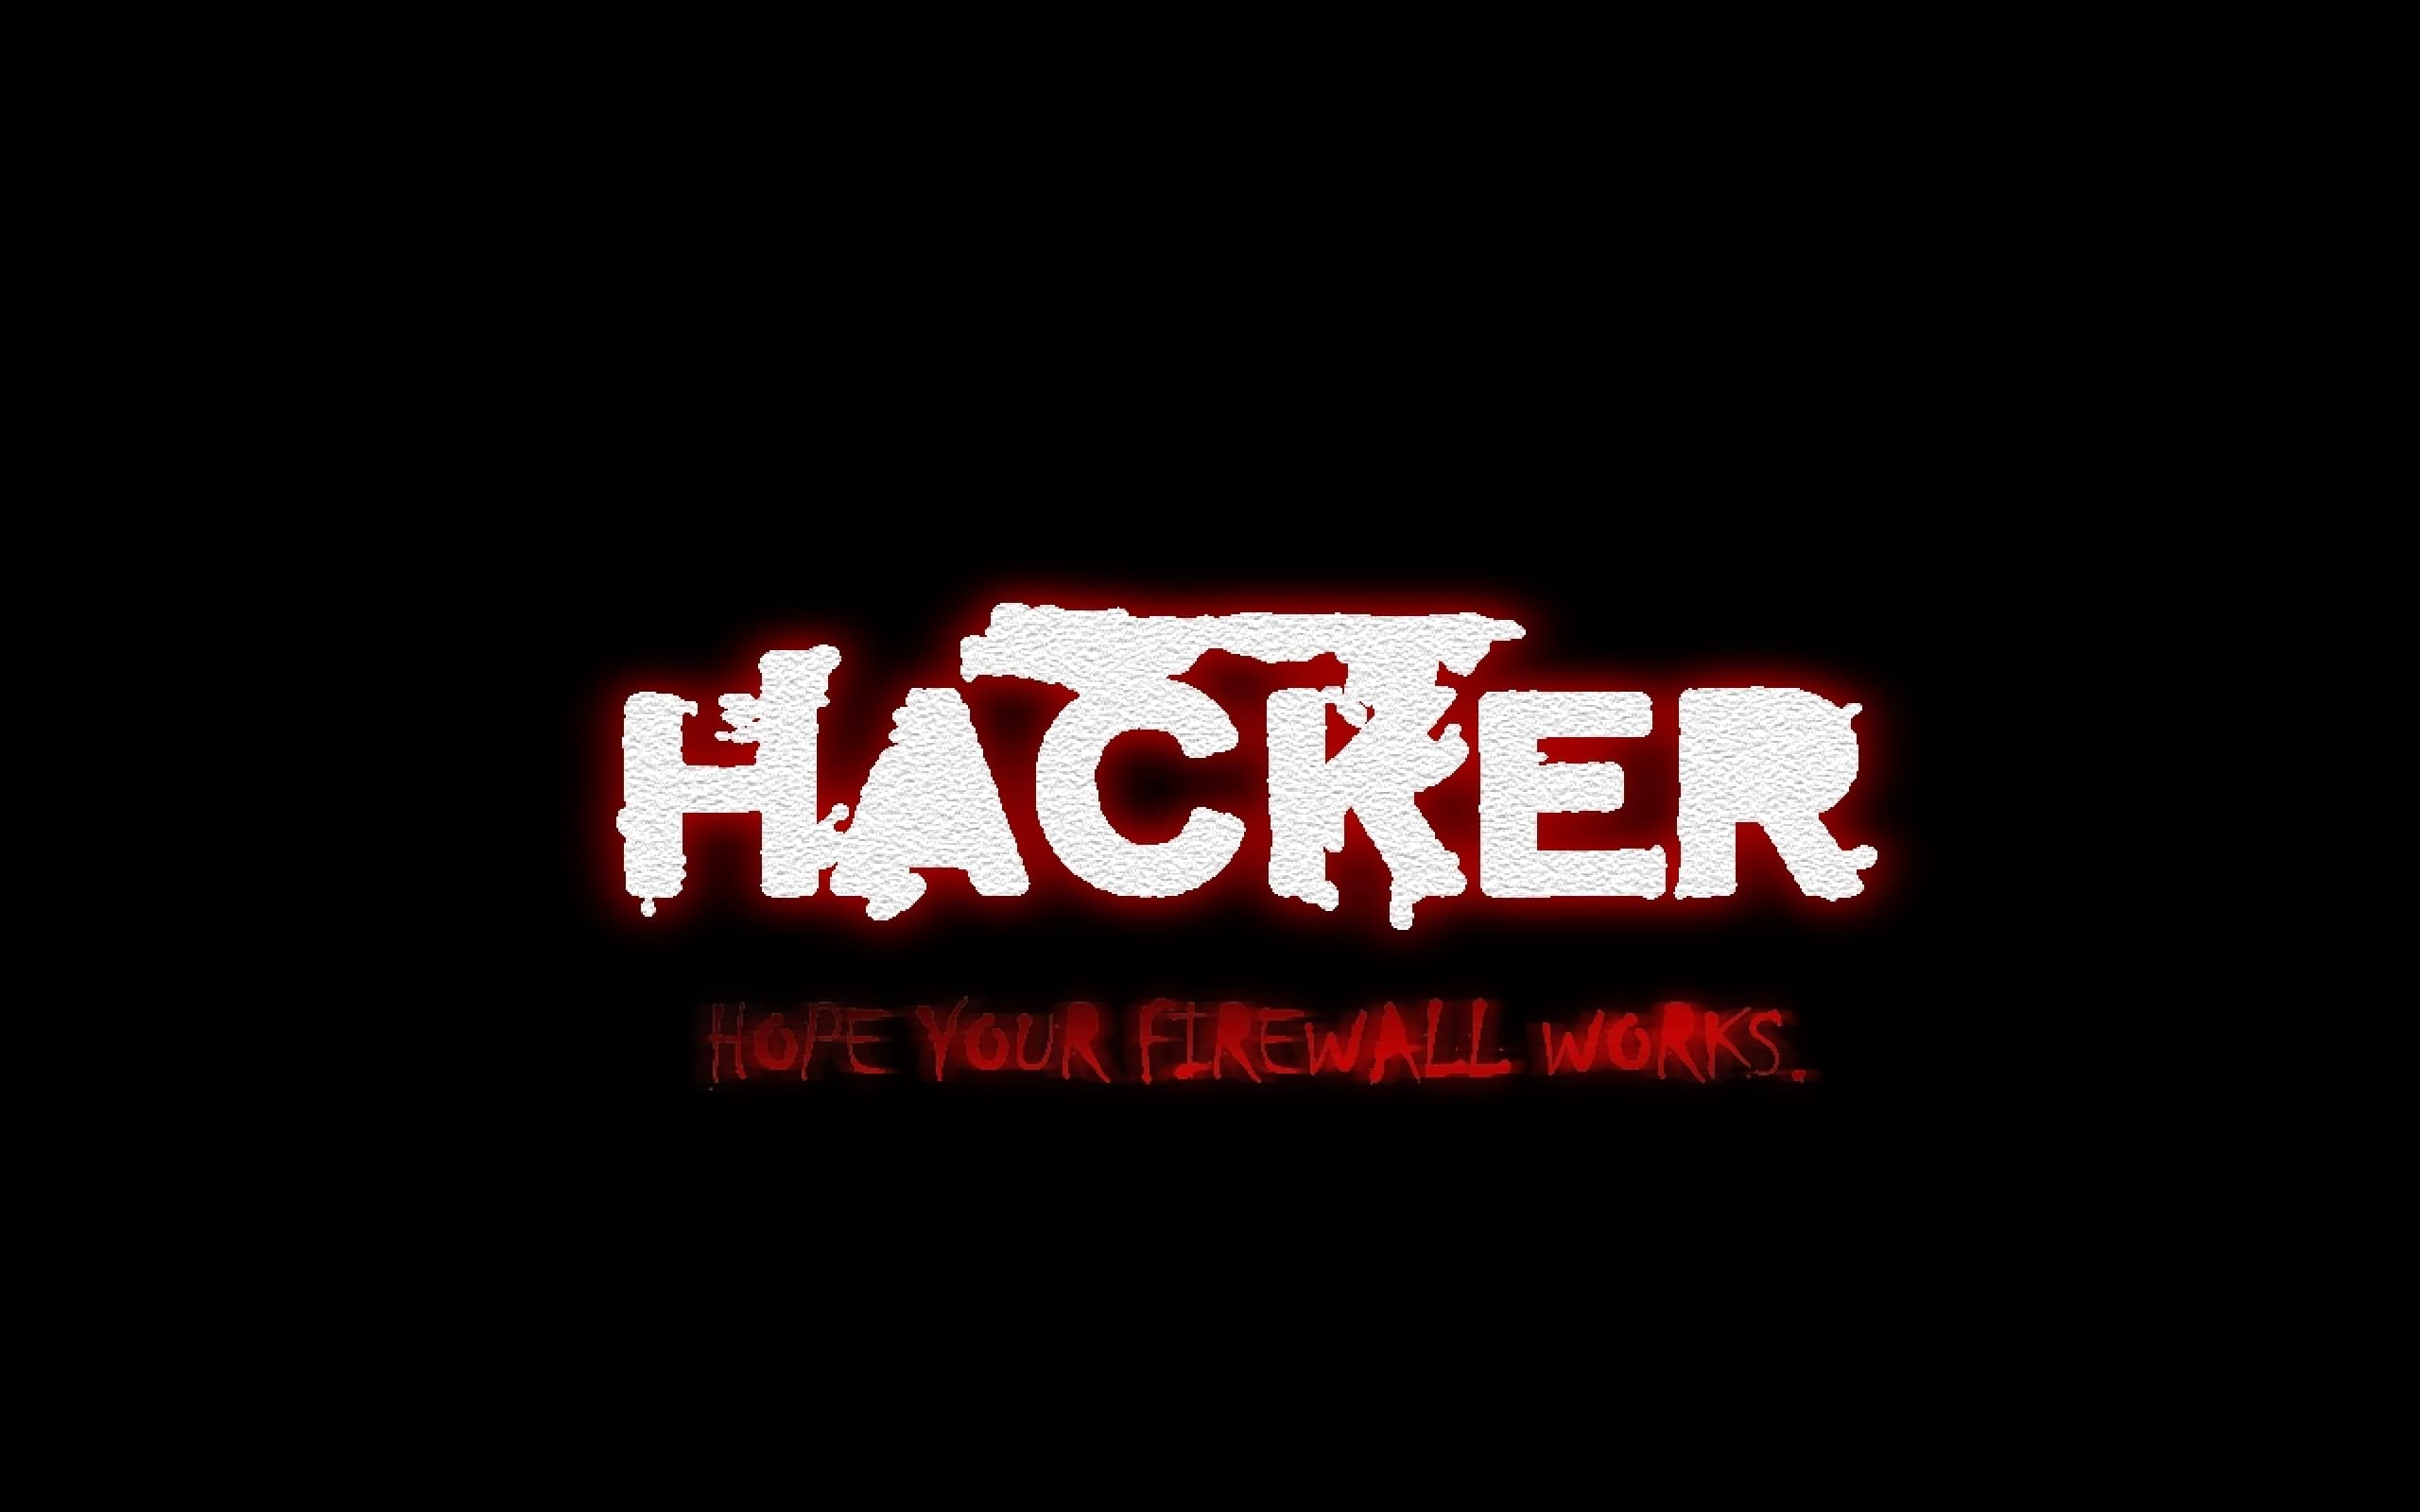 Hacker Wallpaper Pc Kolpaper Awesome Free Hd Wallpapers